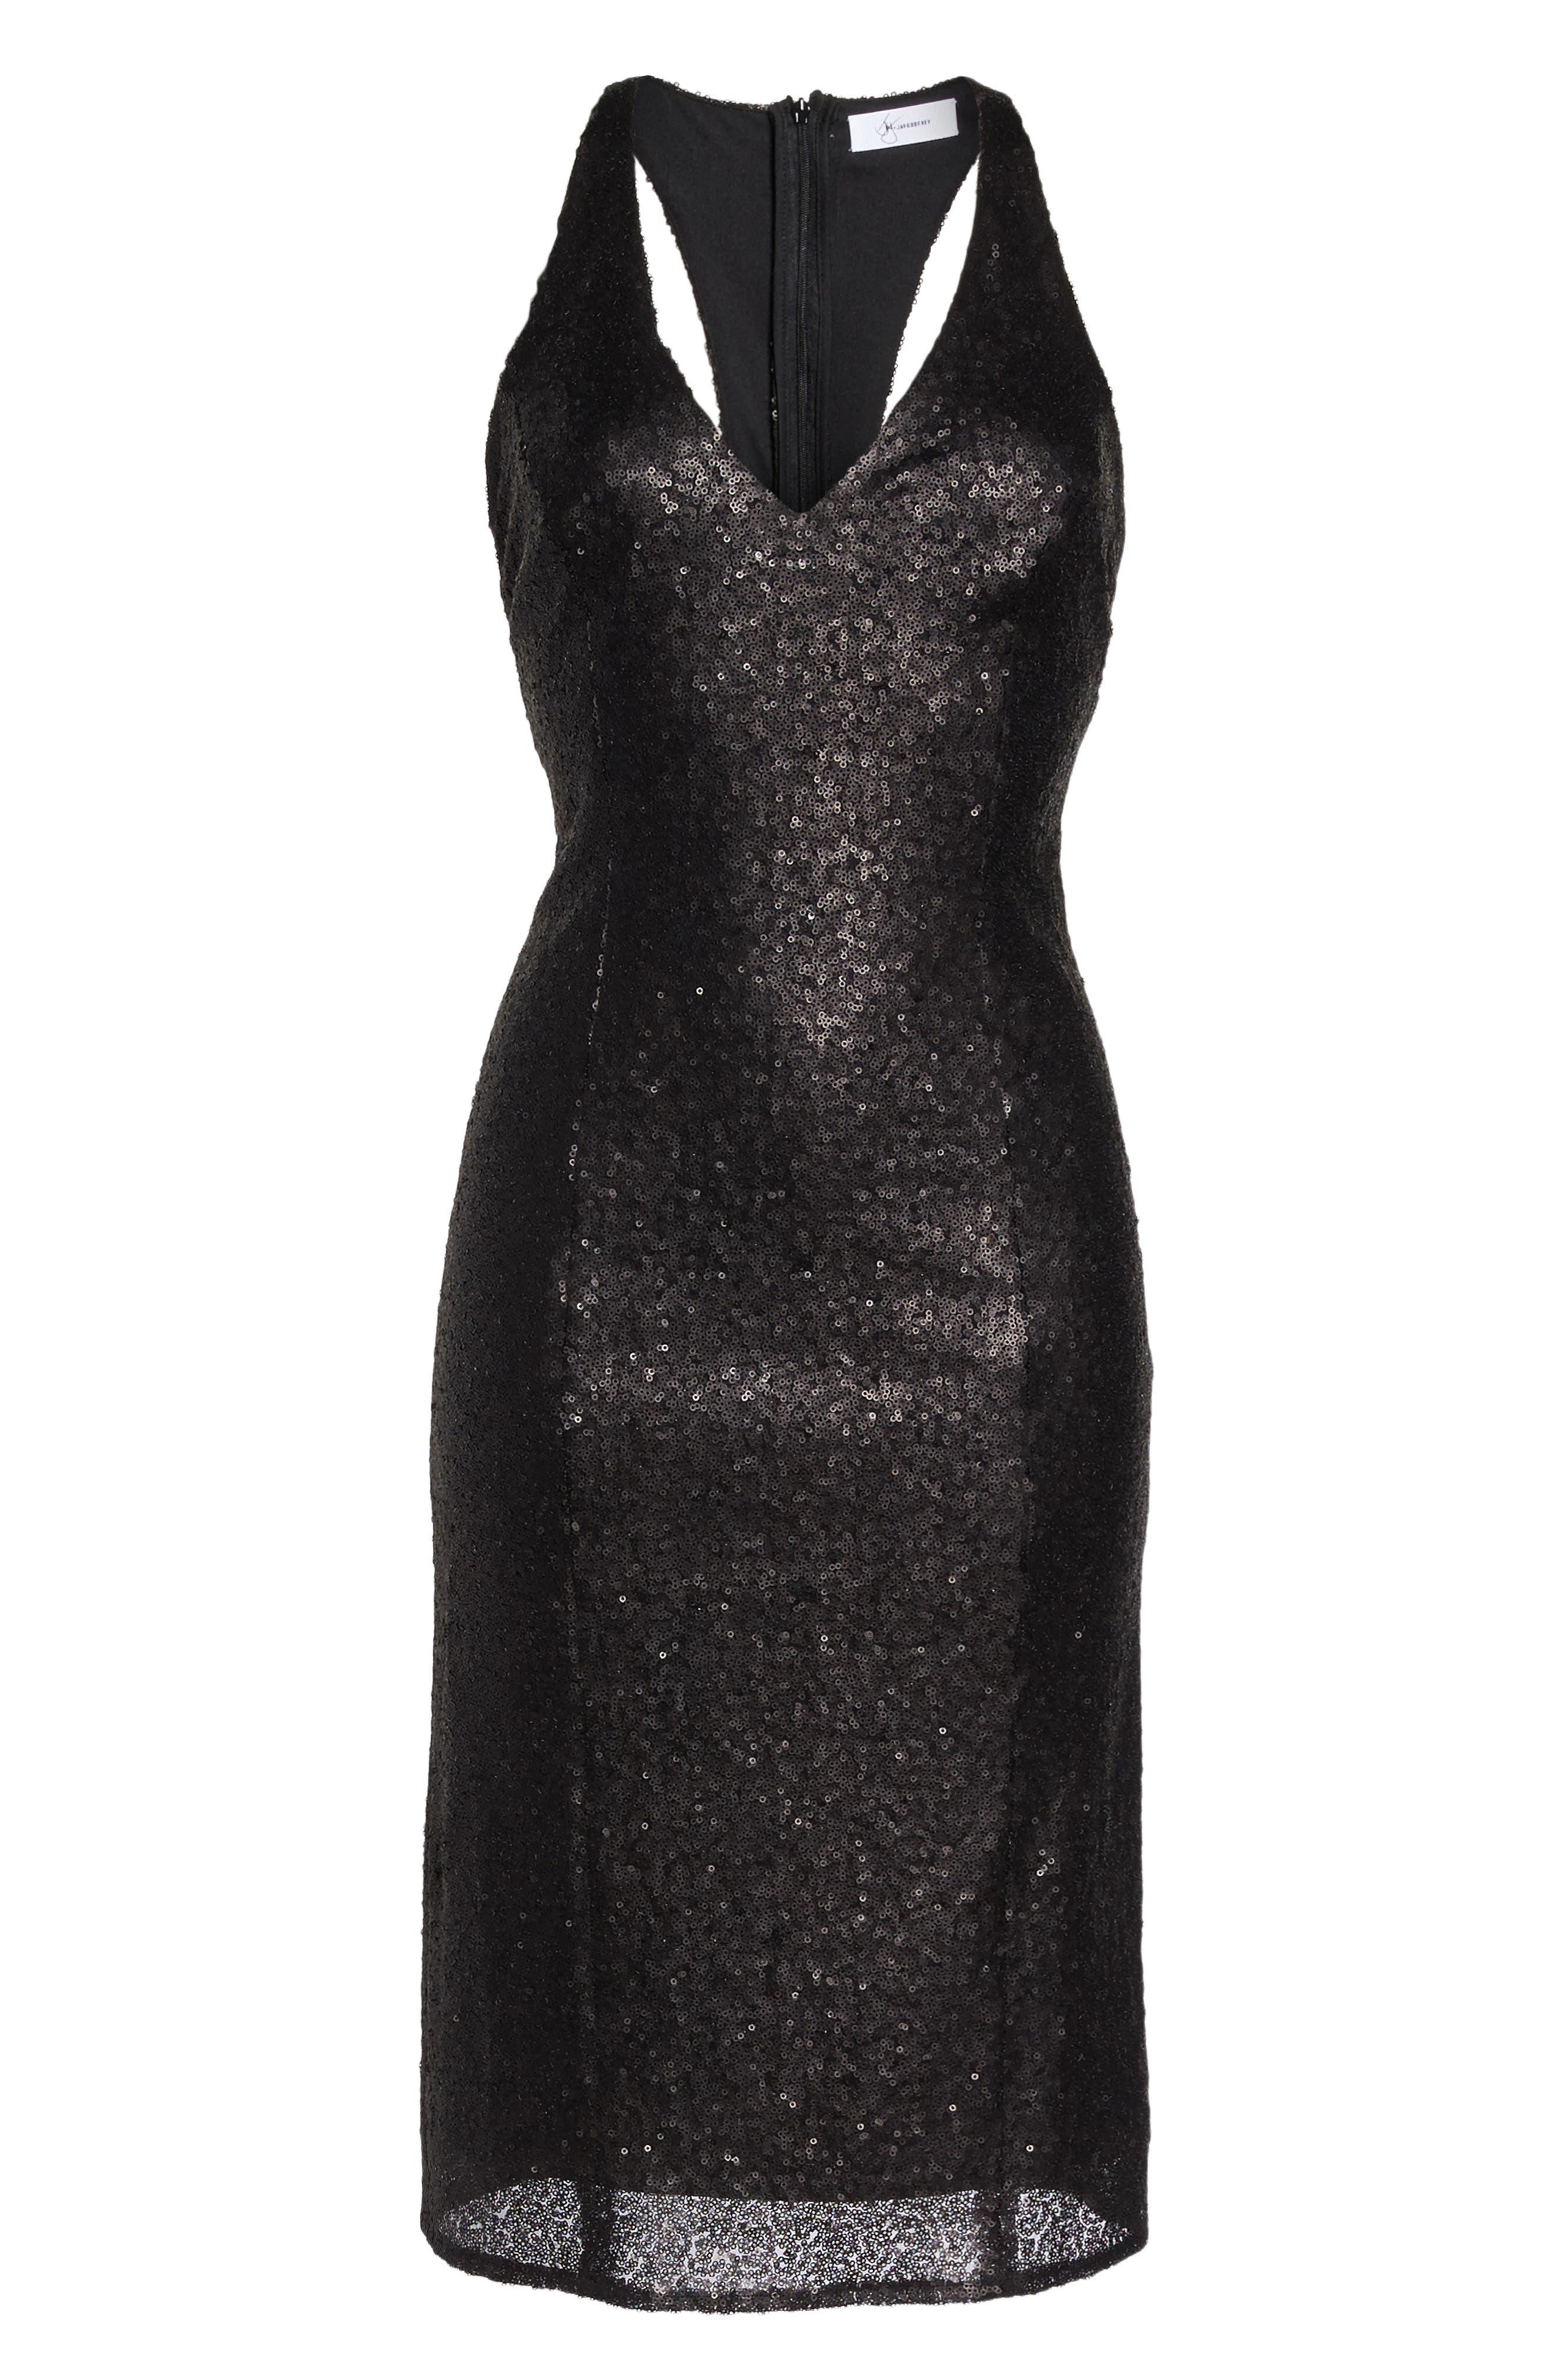 Alo Sequin Halter Dress,                             Alternate thumbnail 6, color,                             001